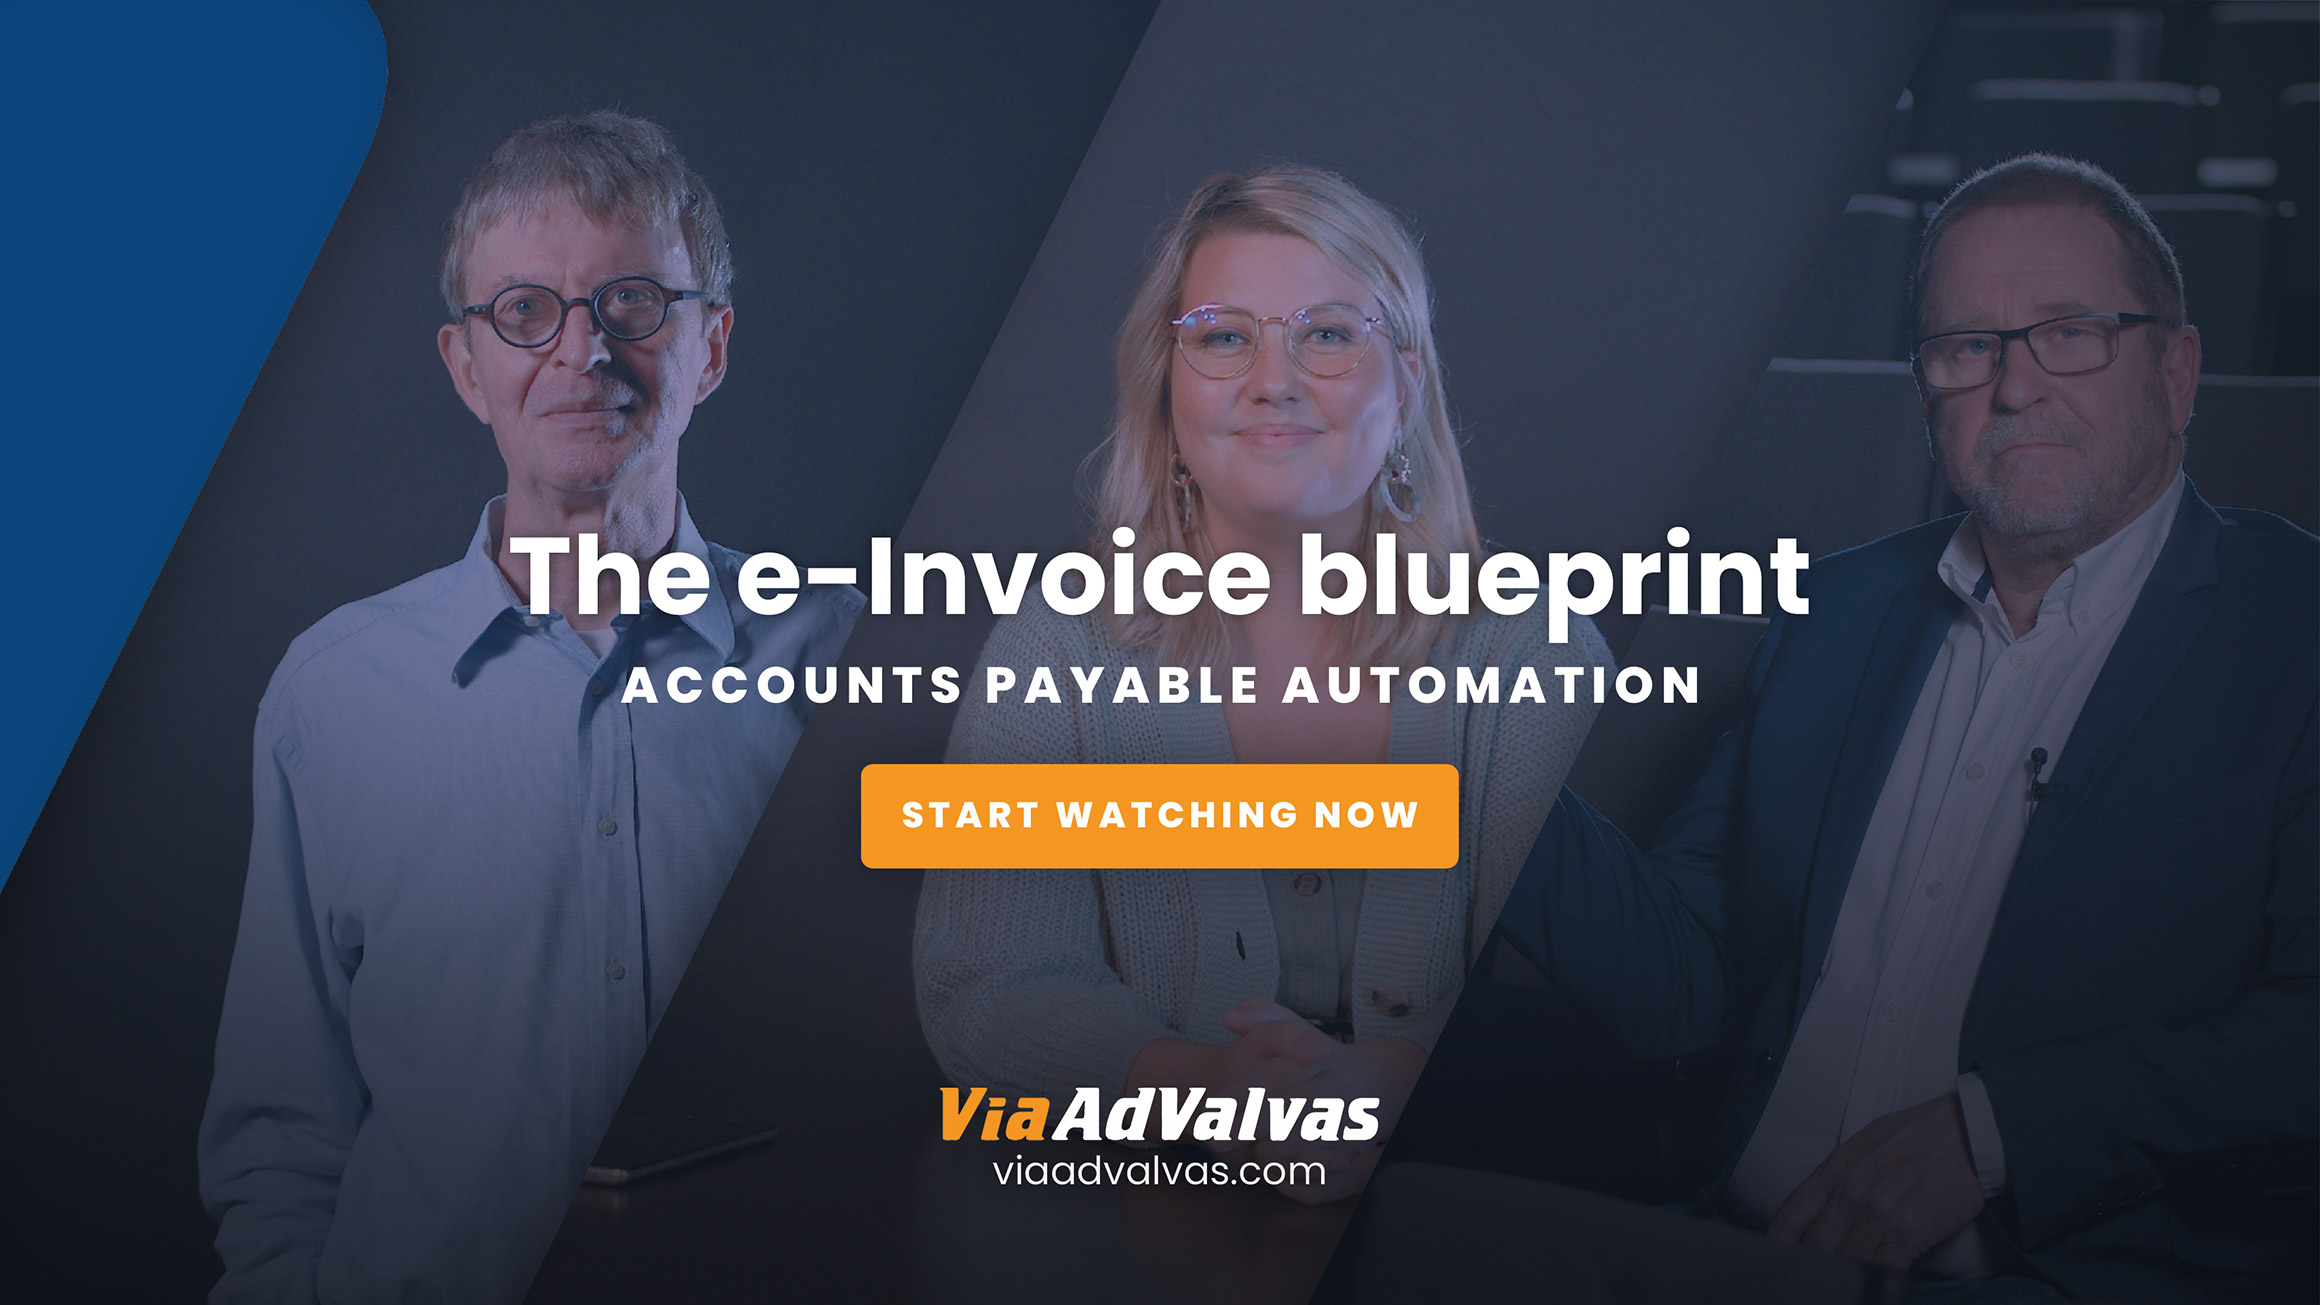 The e-Invoice blueprint